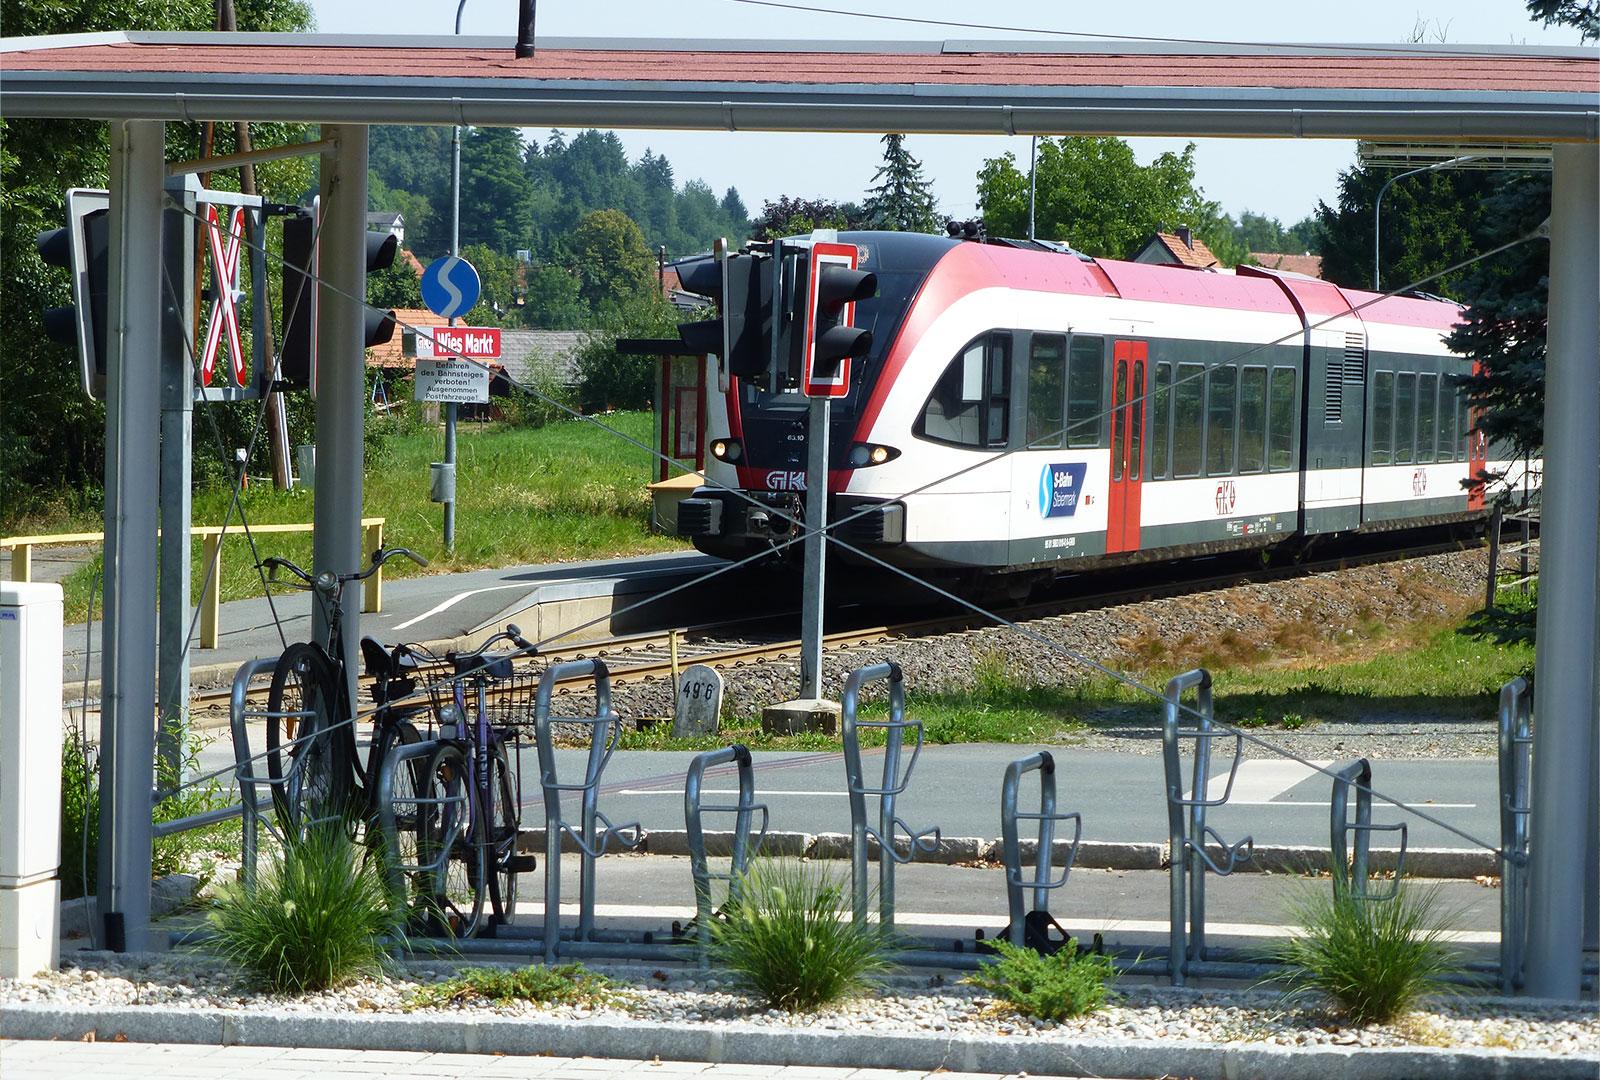 Bus-Bahn-Bike 2